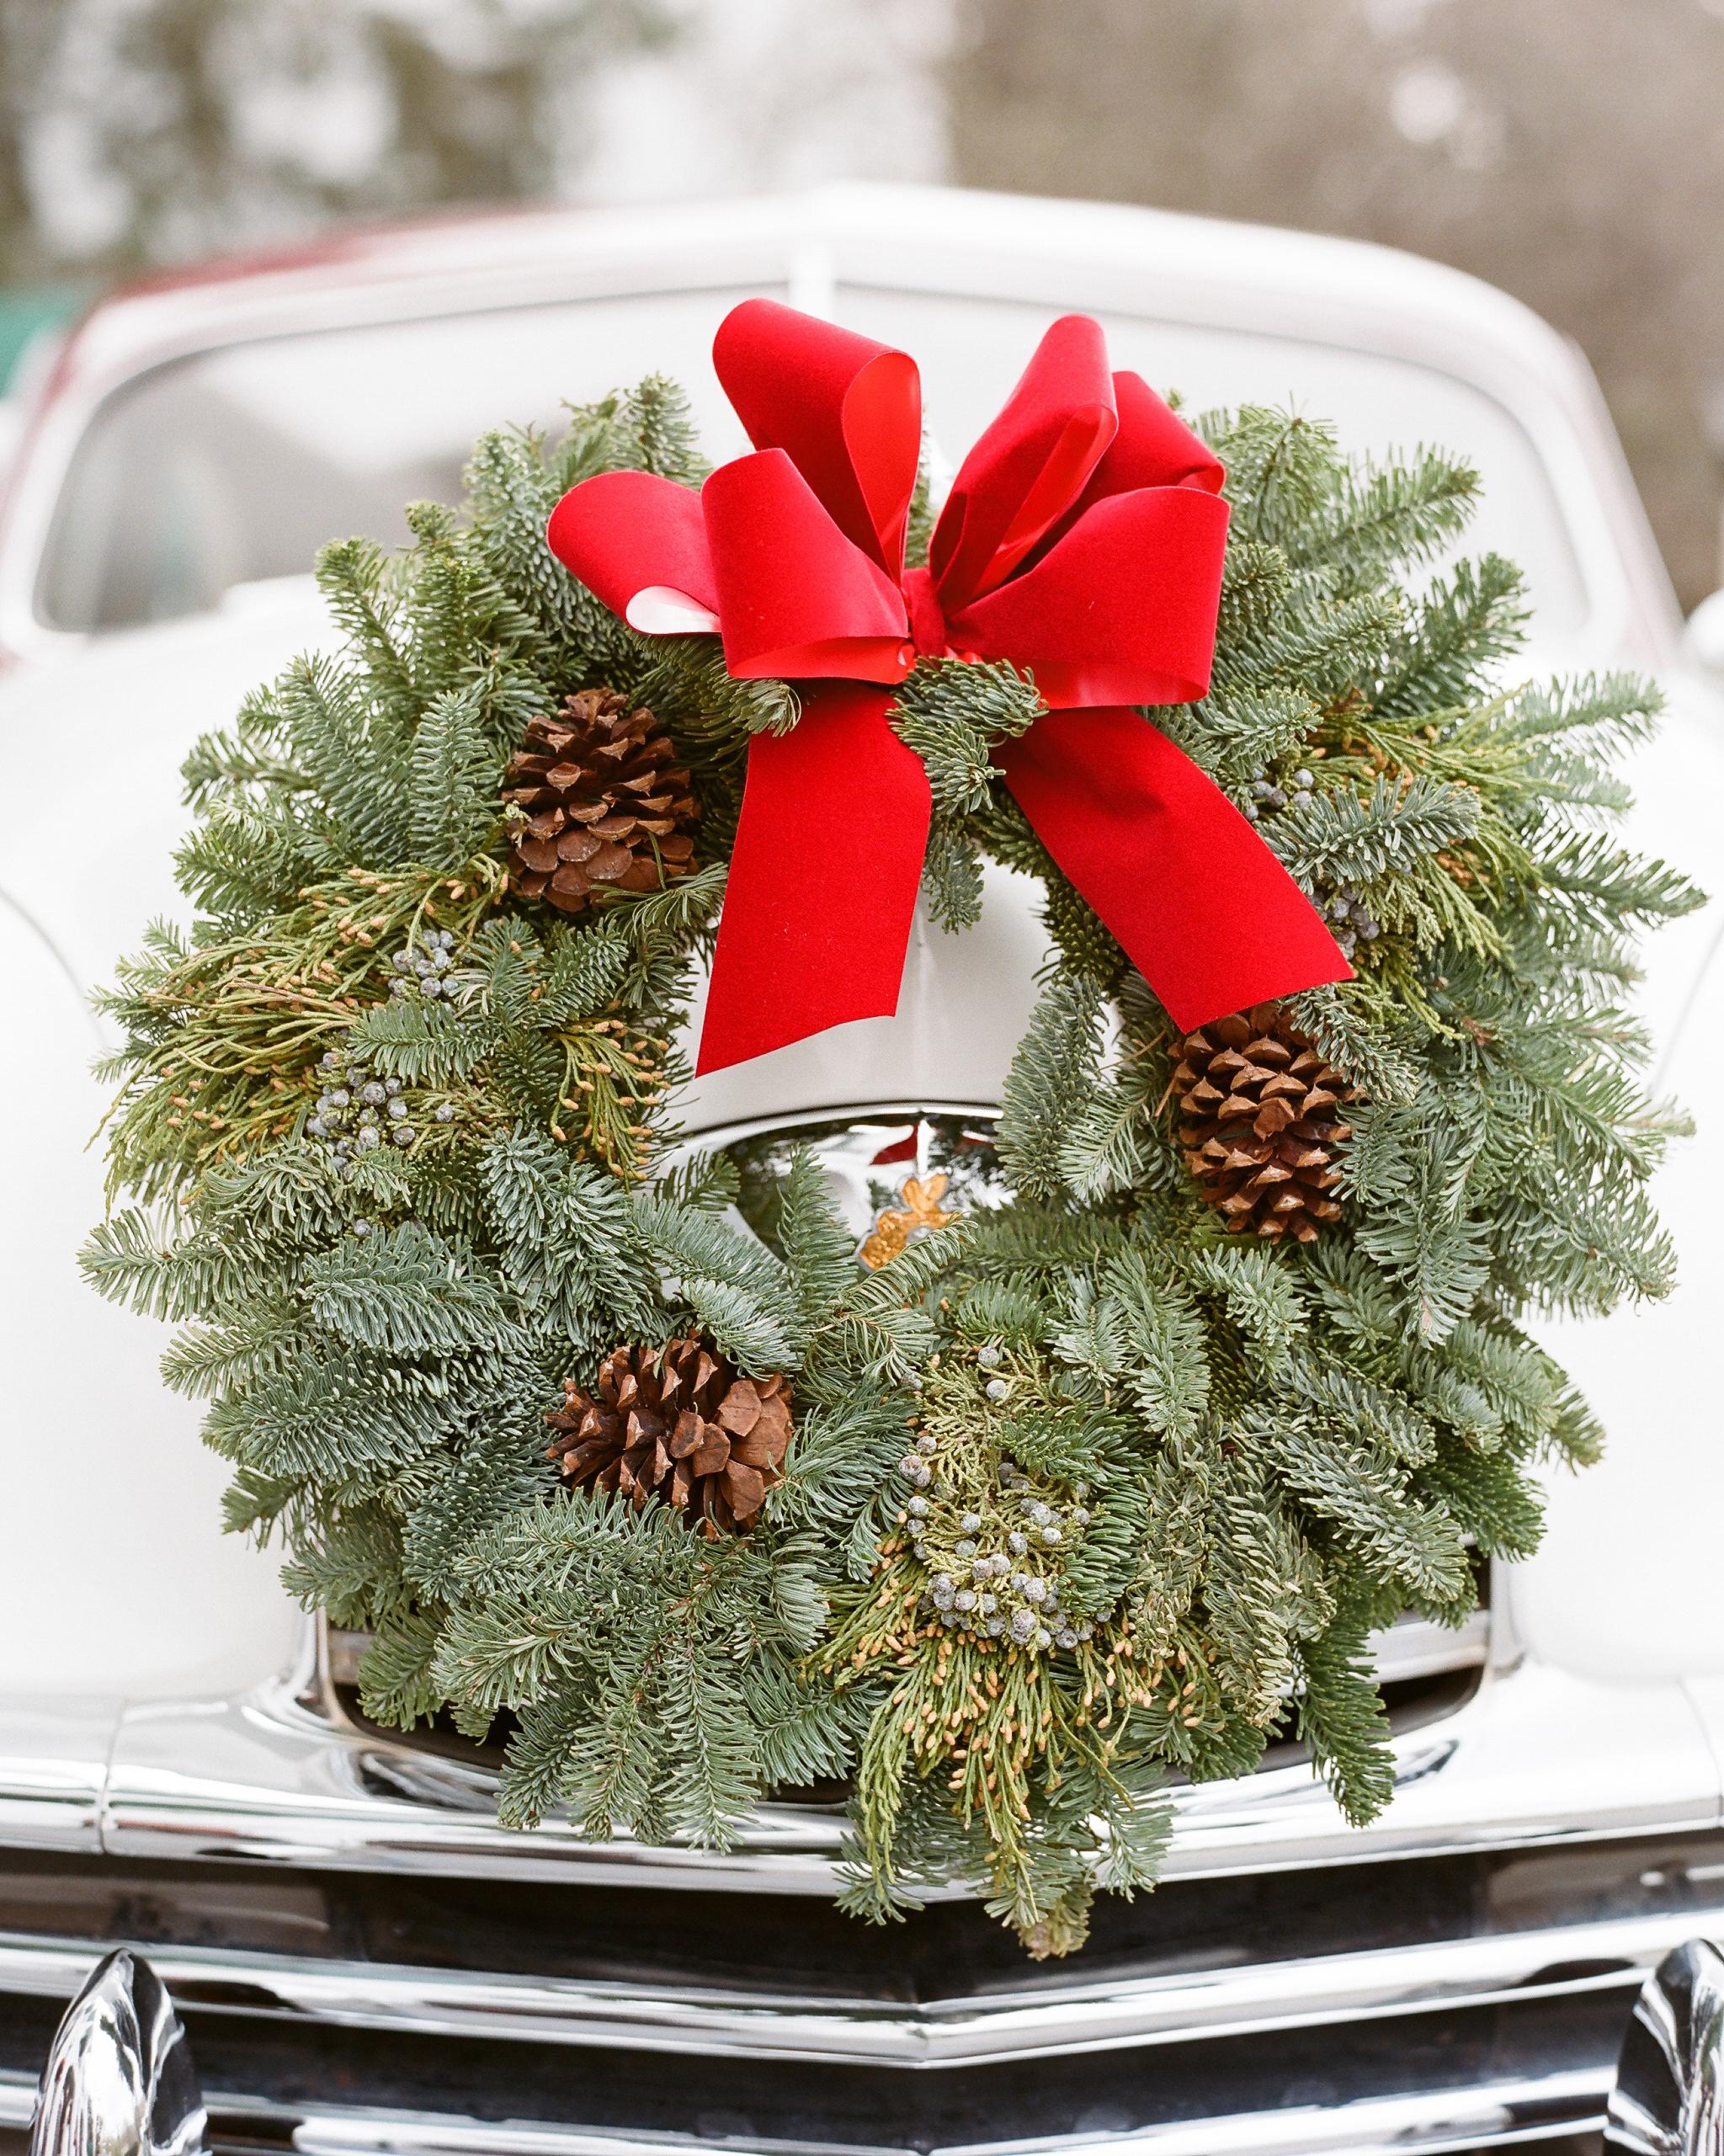 paige-michael-wedding-wreath-0603-s112431-1215.jpg